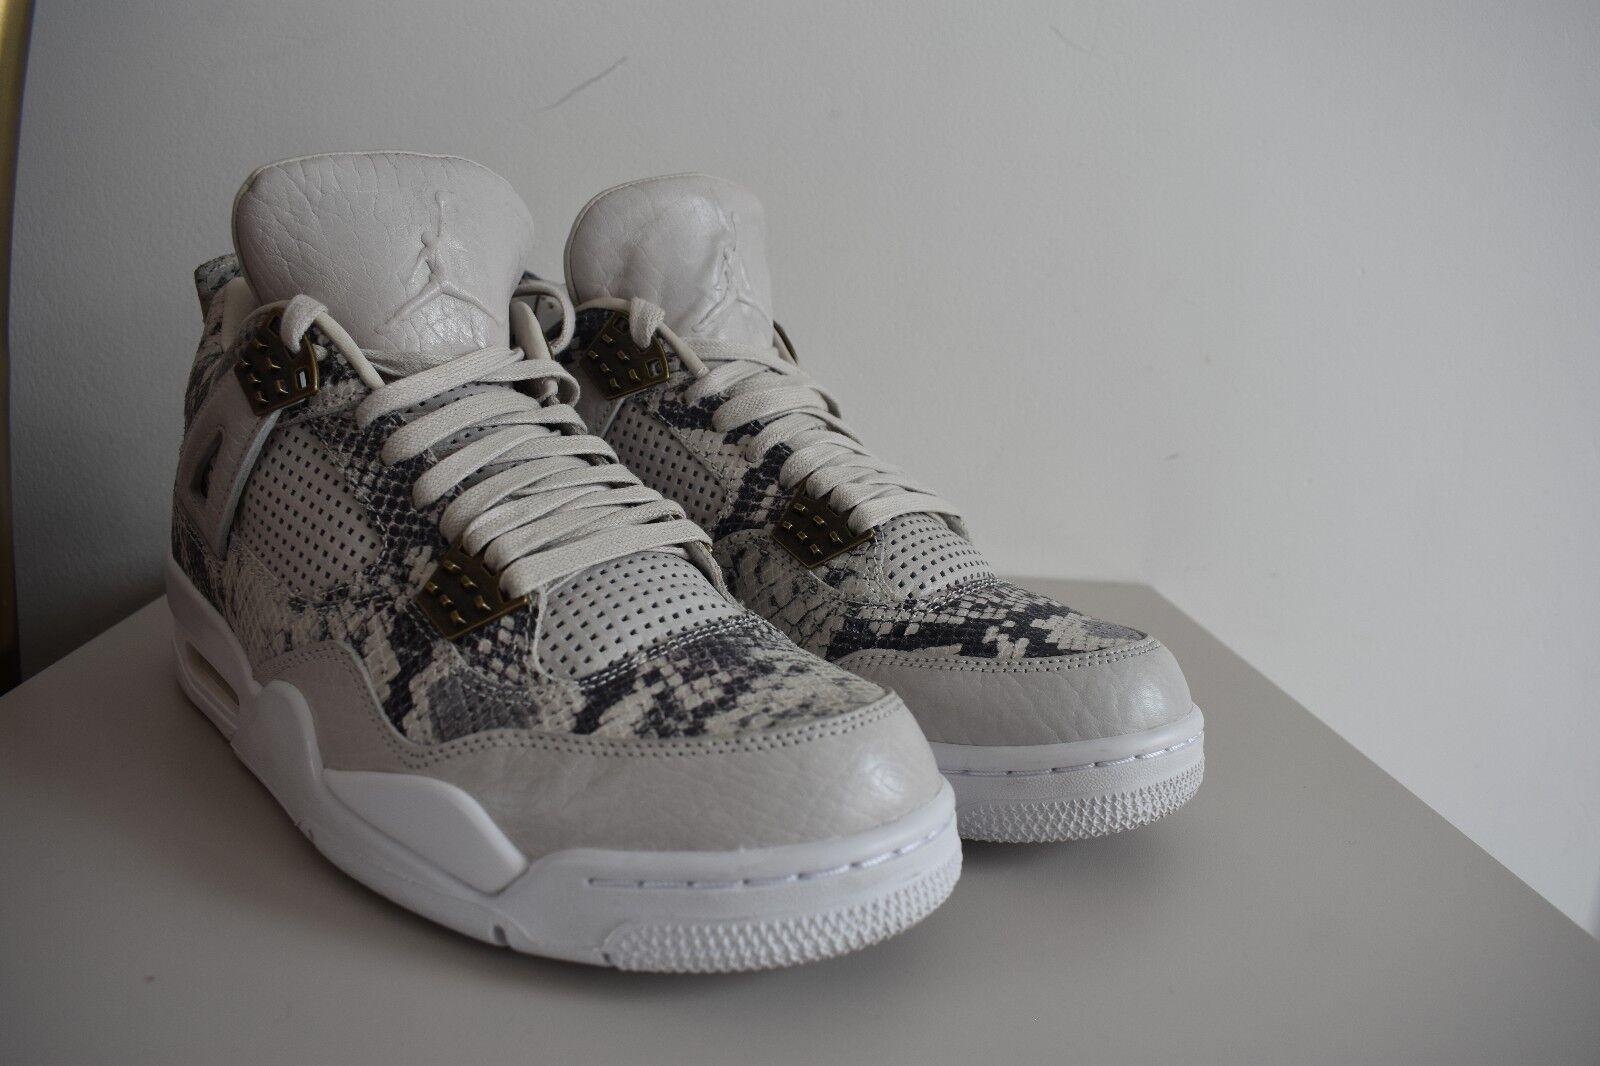 Premium Air Jordan Retro 4, Pelle di serpente. LIMITED Edition. Taglia 9 UK (RARA)